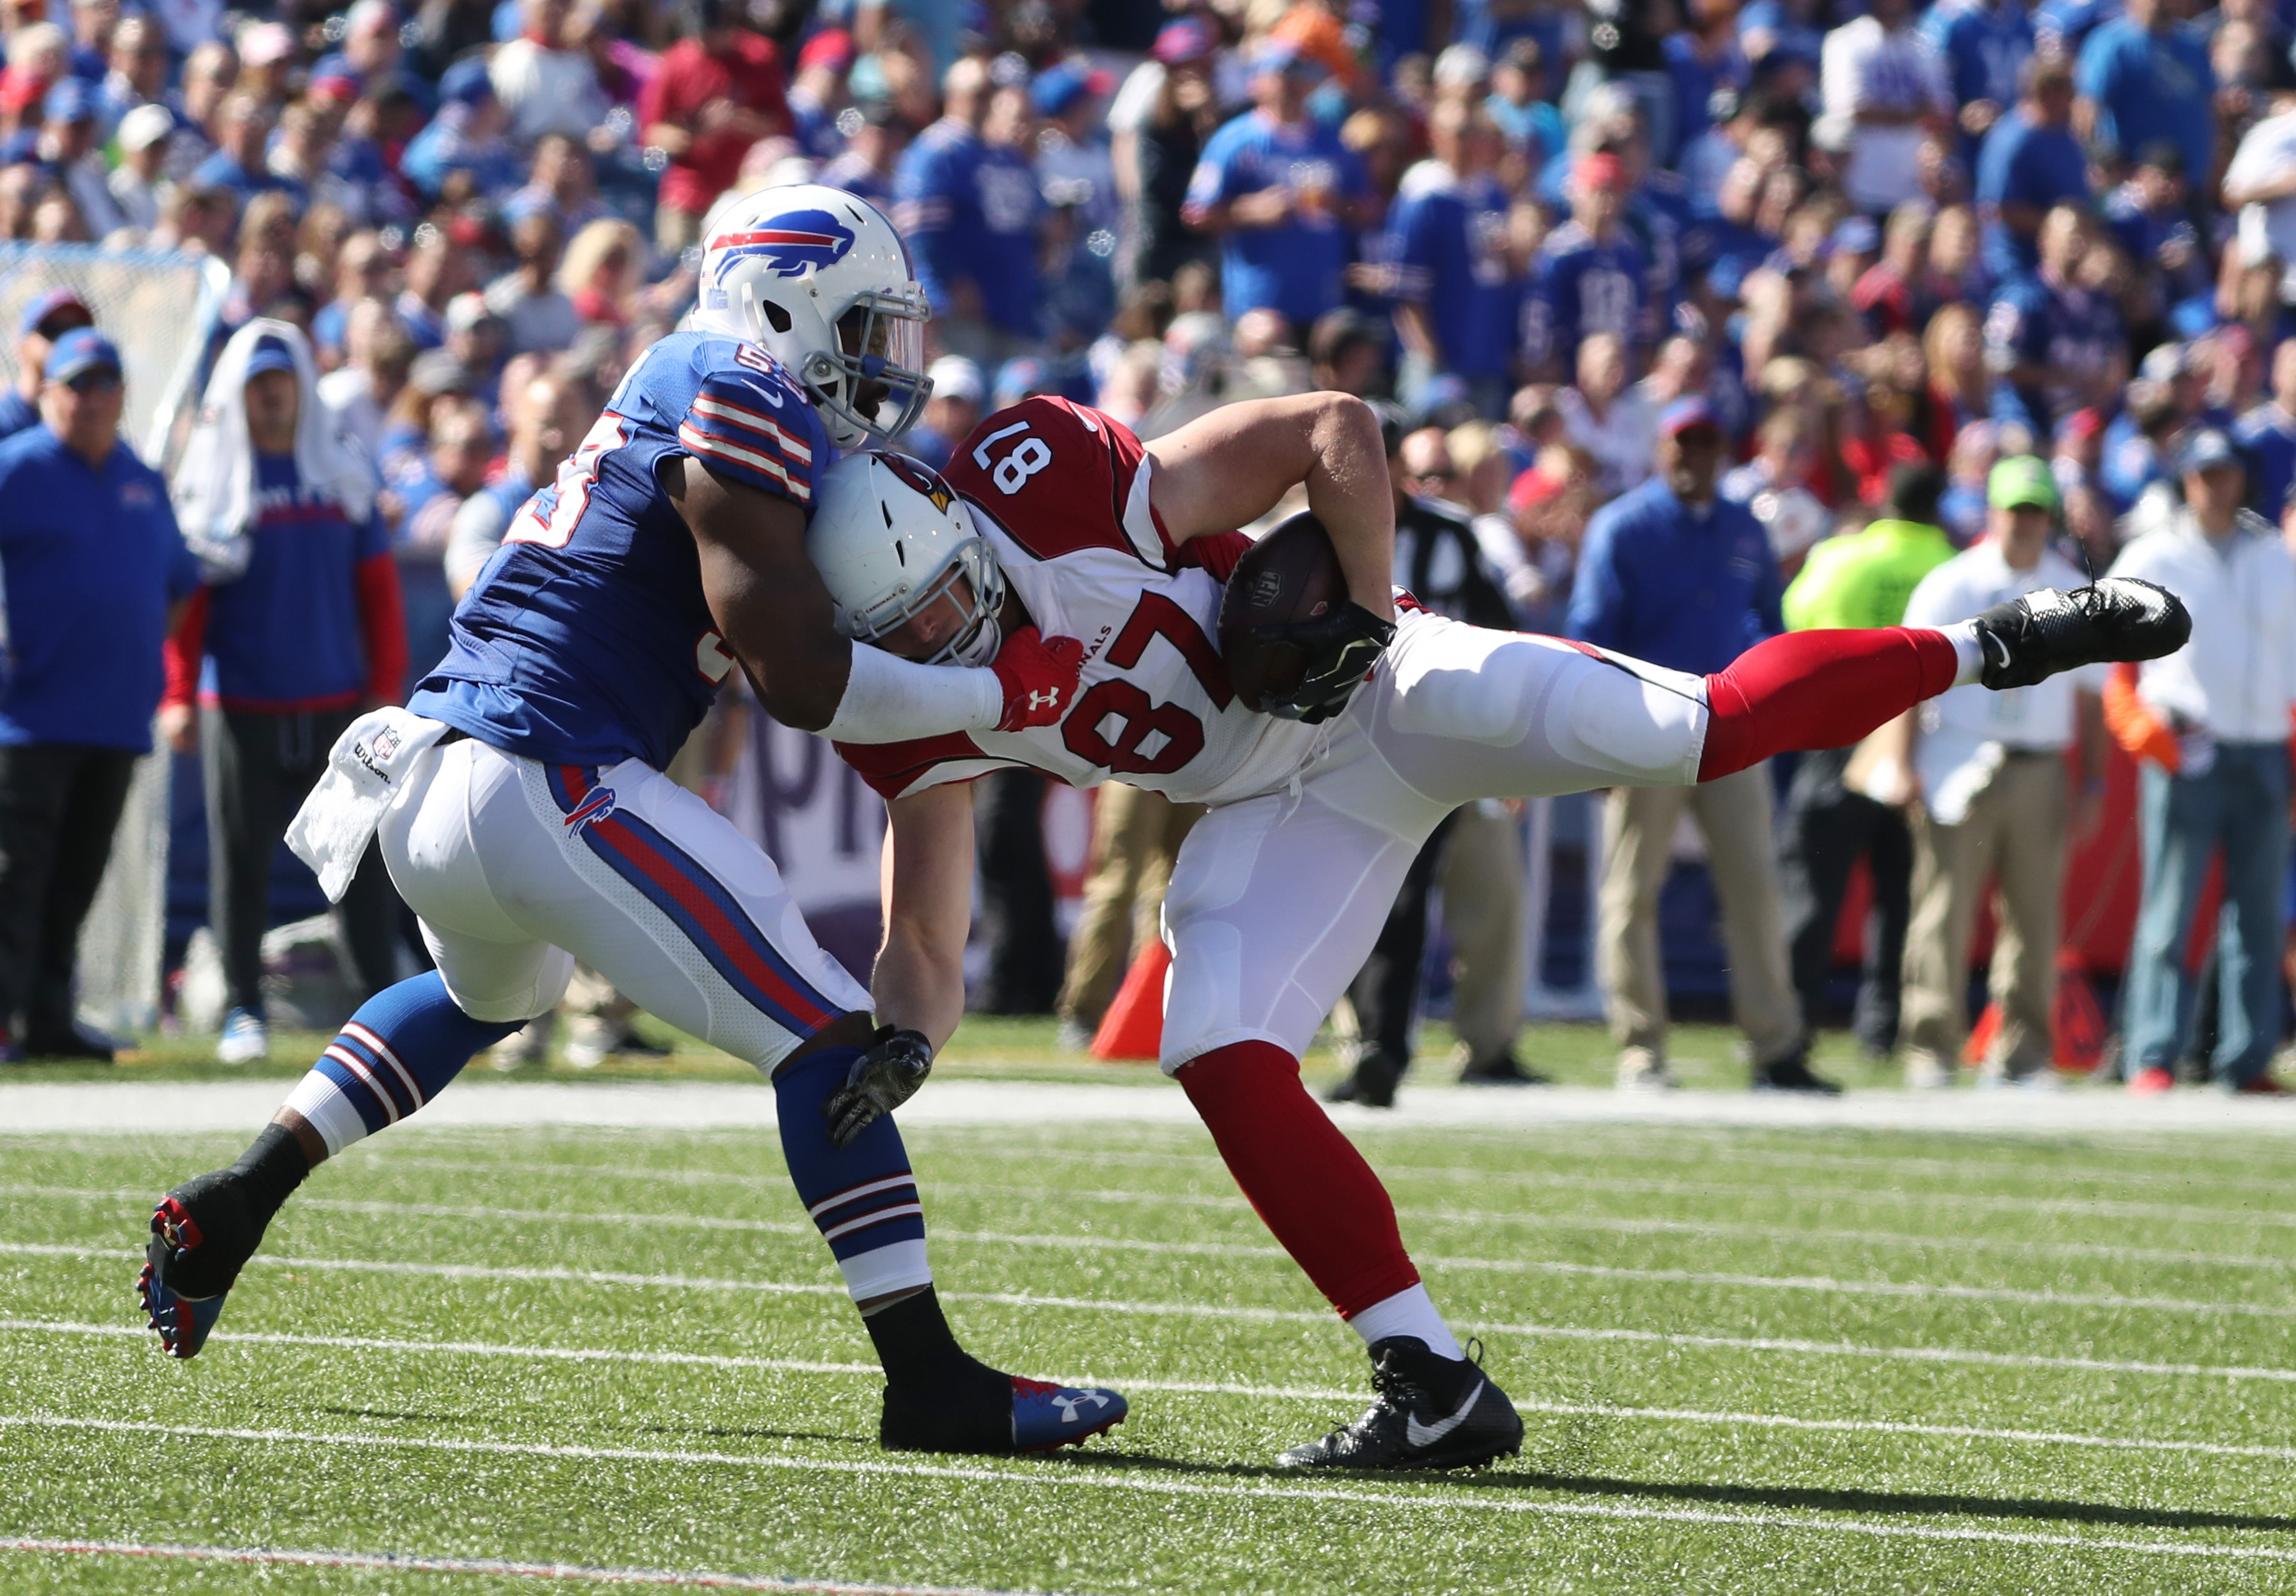 Buffalo Bills linebacker Zach Brown brings down Arizona Cardinals tight end Troy Niklas for one of his team-leading 34 tackles. (James P. McCoy/Buffalo News)